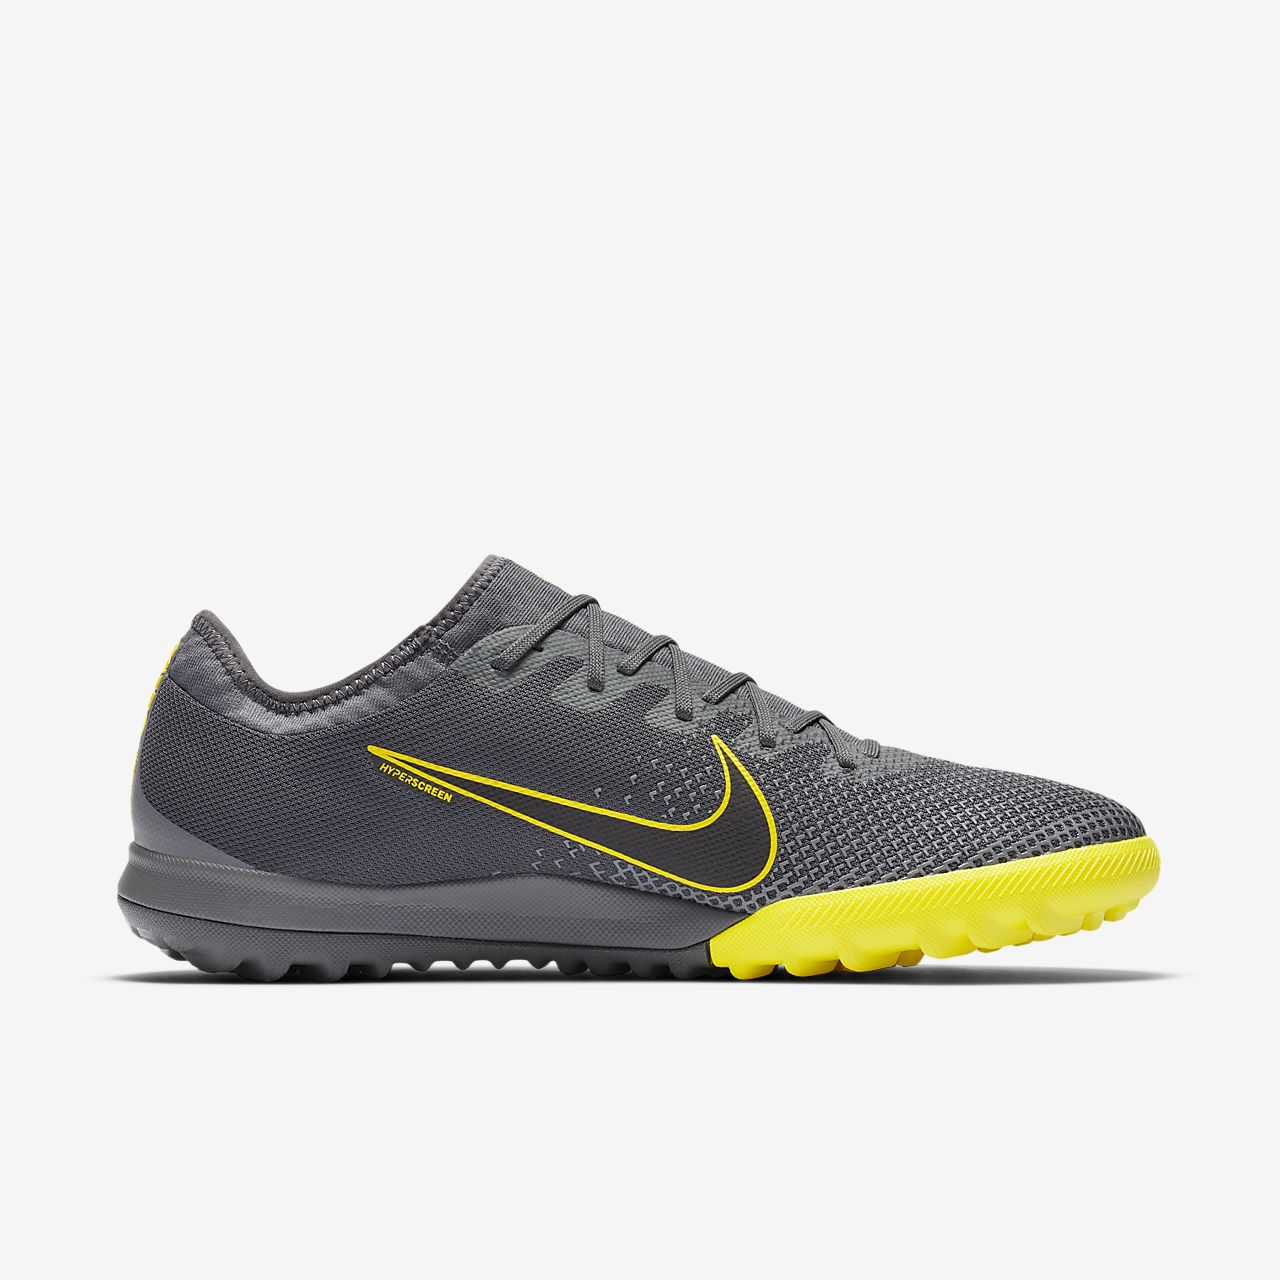 hot sales ca13e aaf81 Nike MercurialX Vapor XII Pro TF-fodboldsko til grus. Nike.com DK